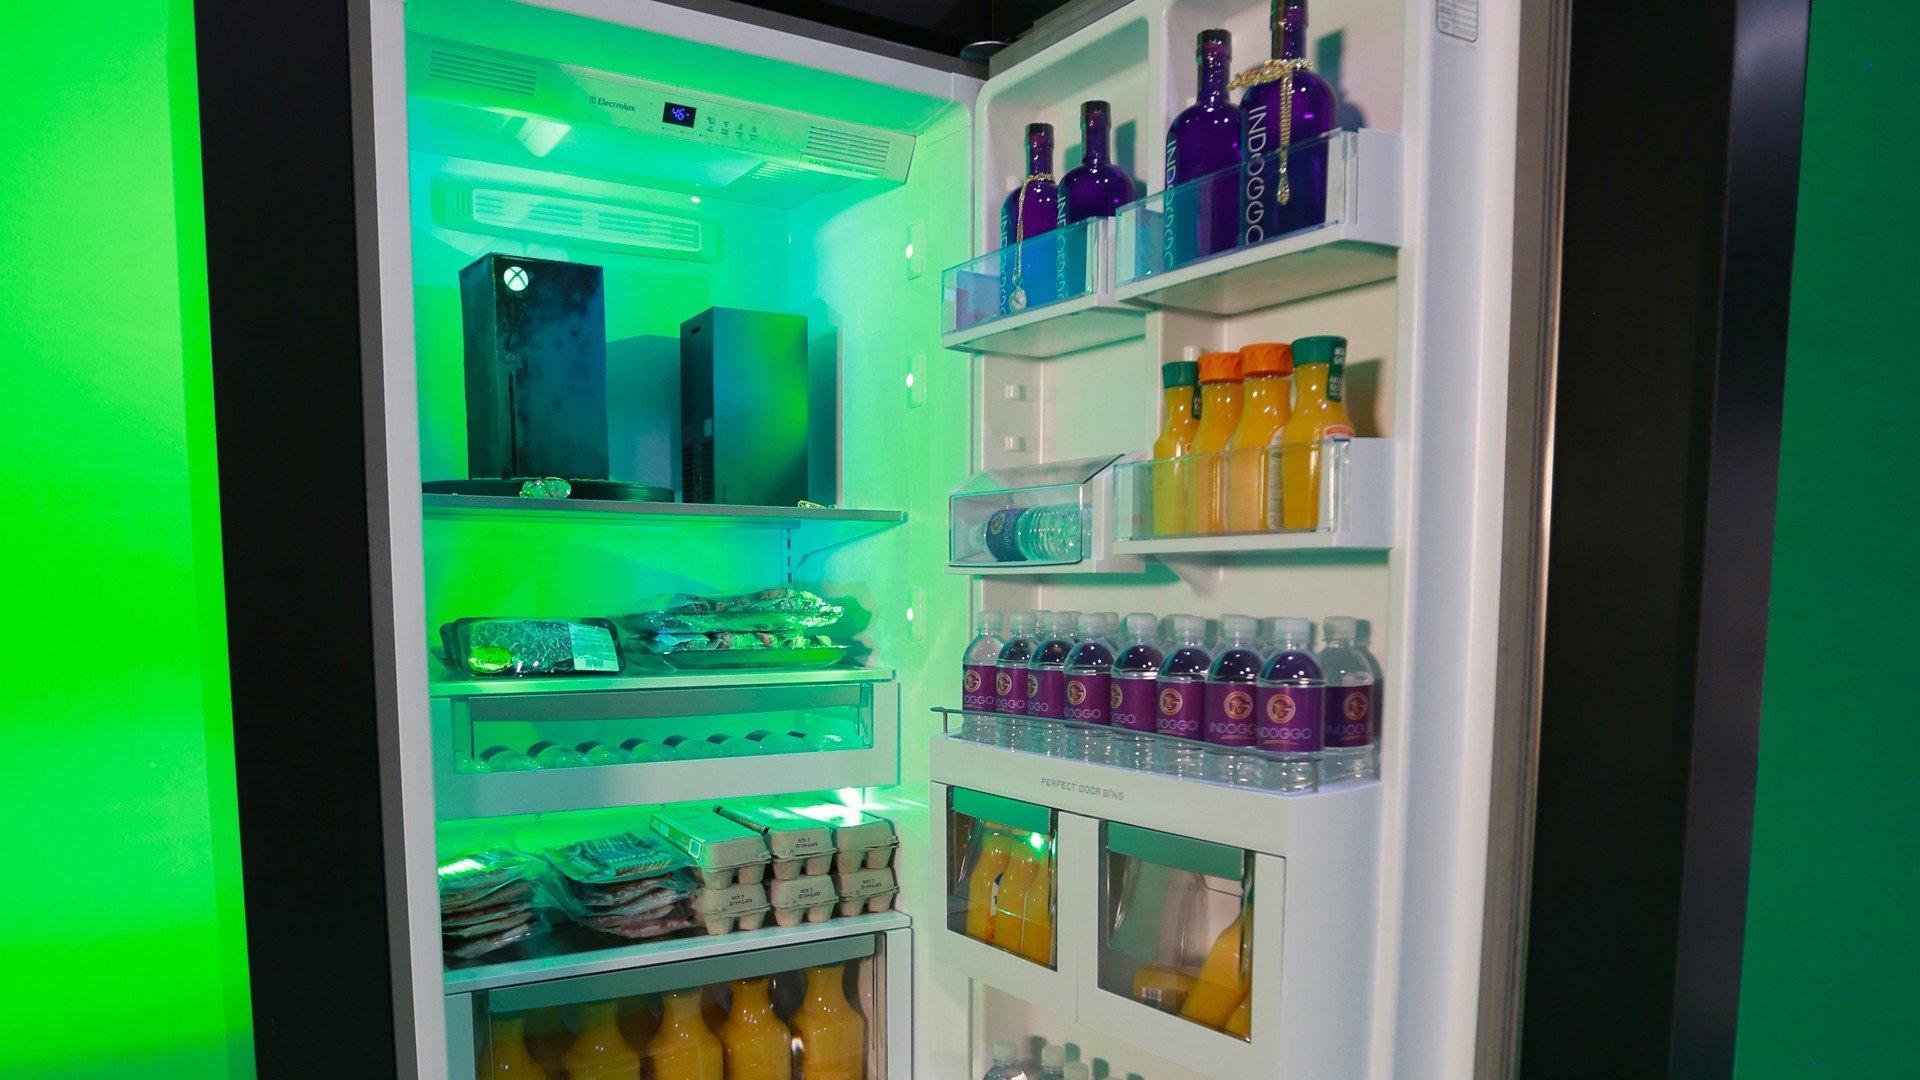 Microsoft made an Xbox Series X fridge 16